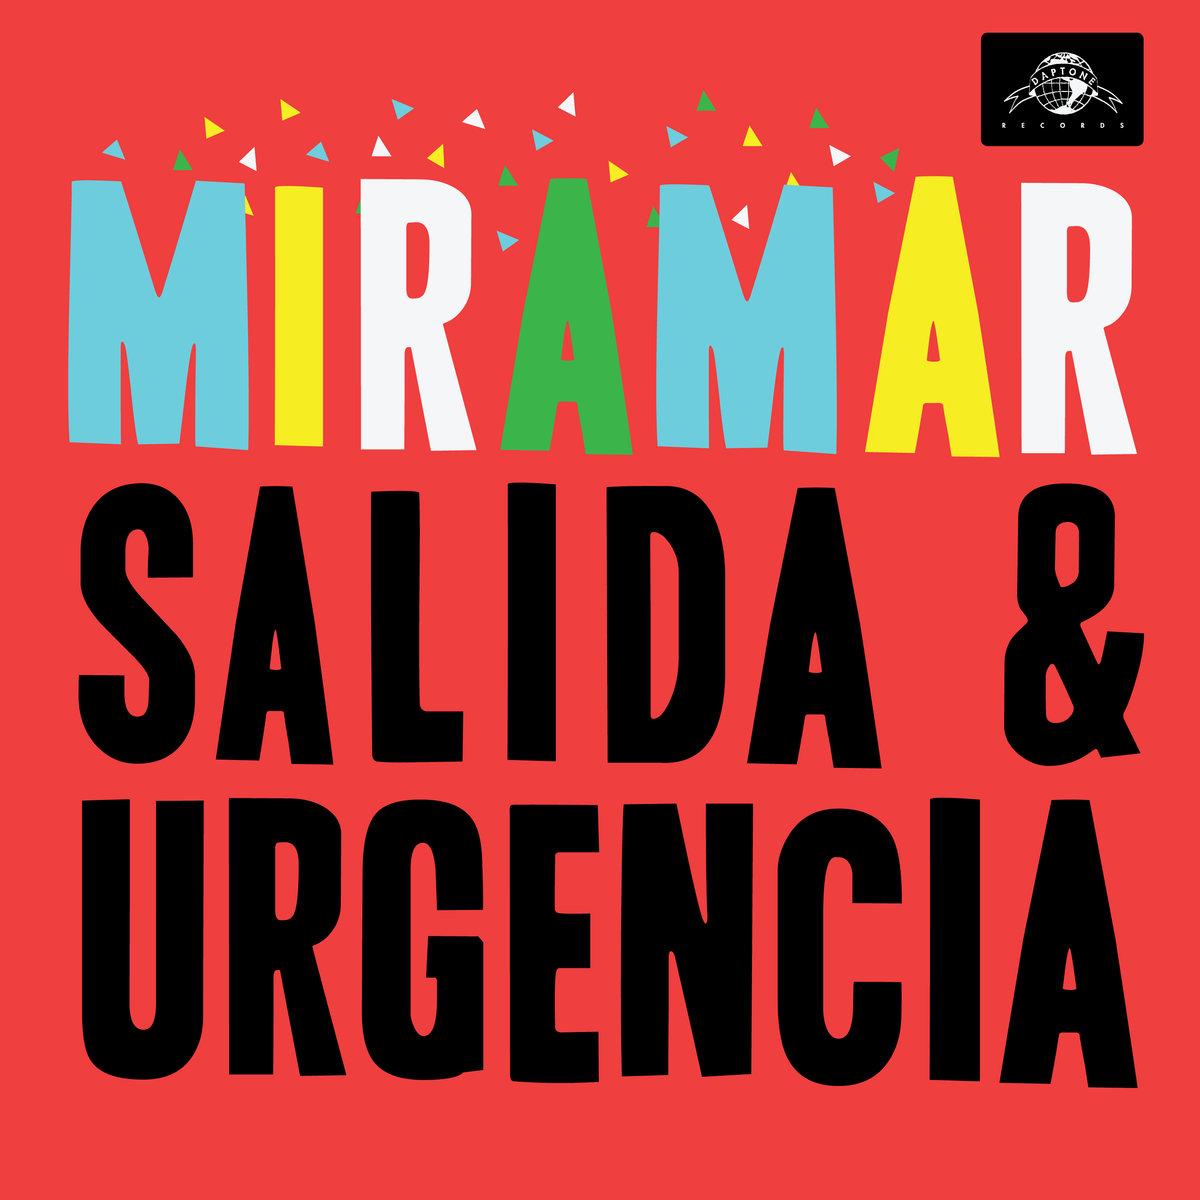 Miramar-Salida-Urgenica-Artwork.jpg